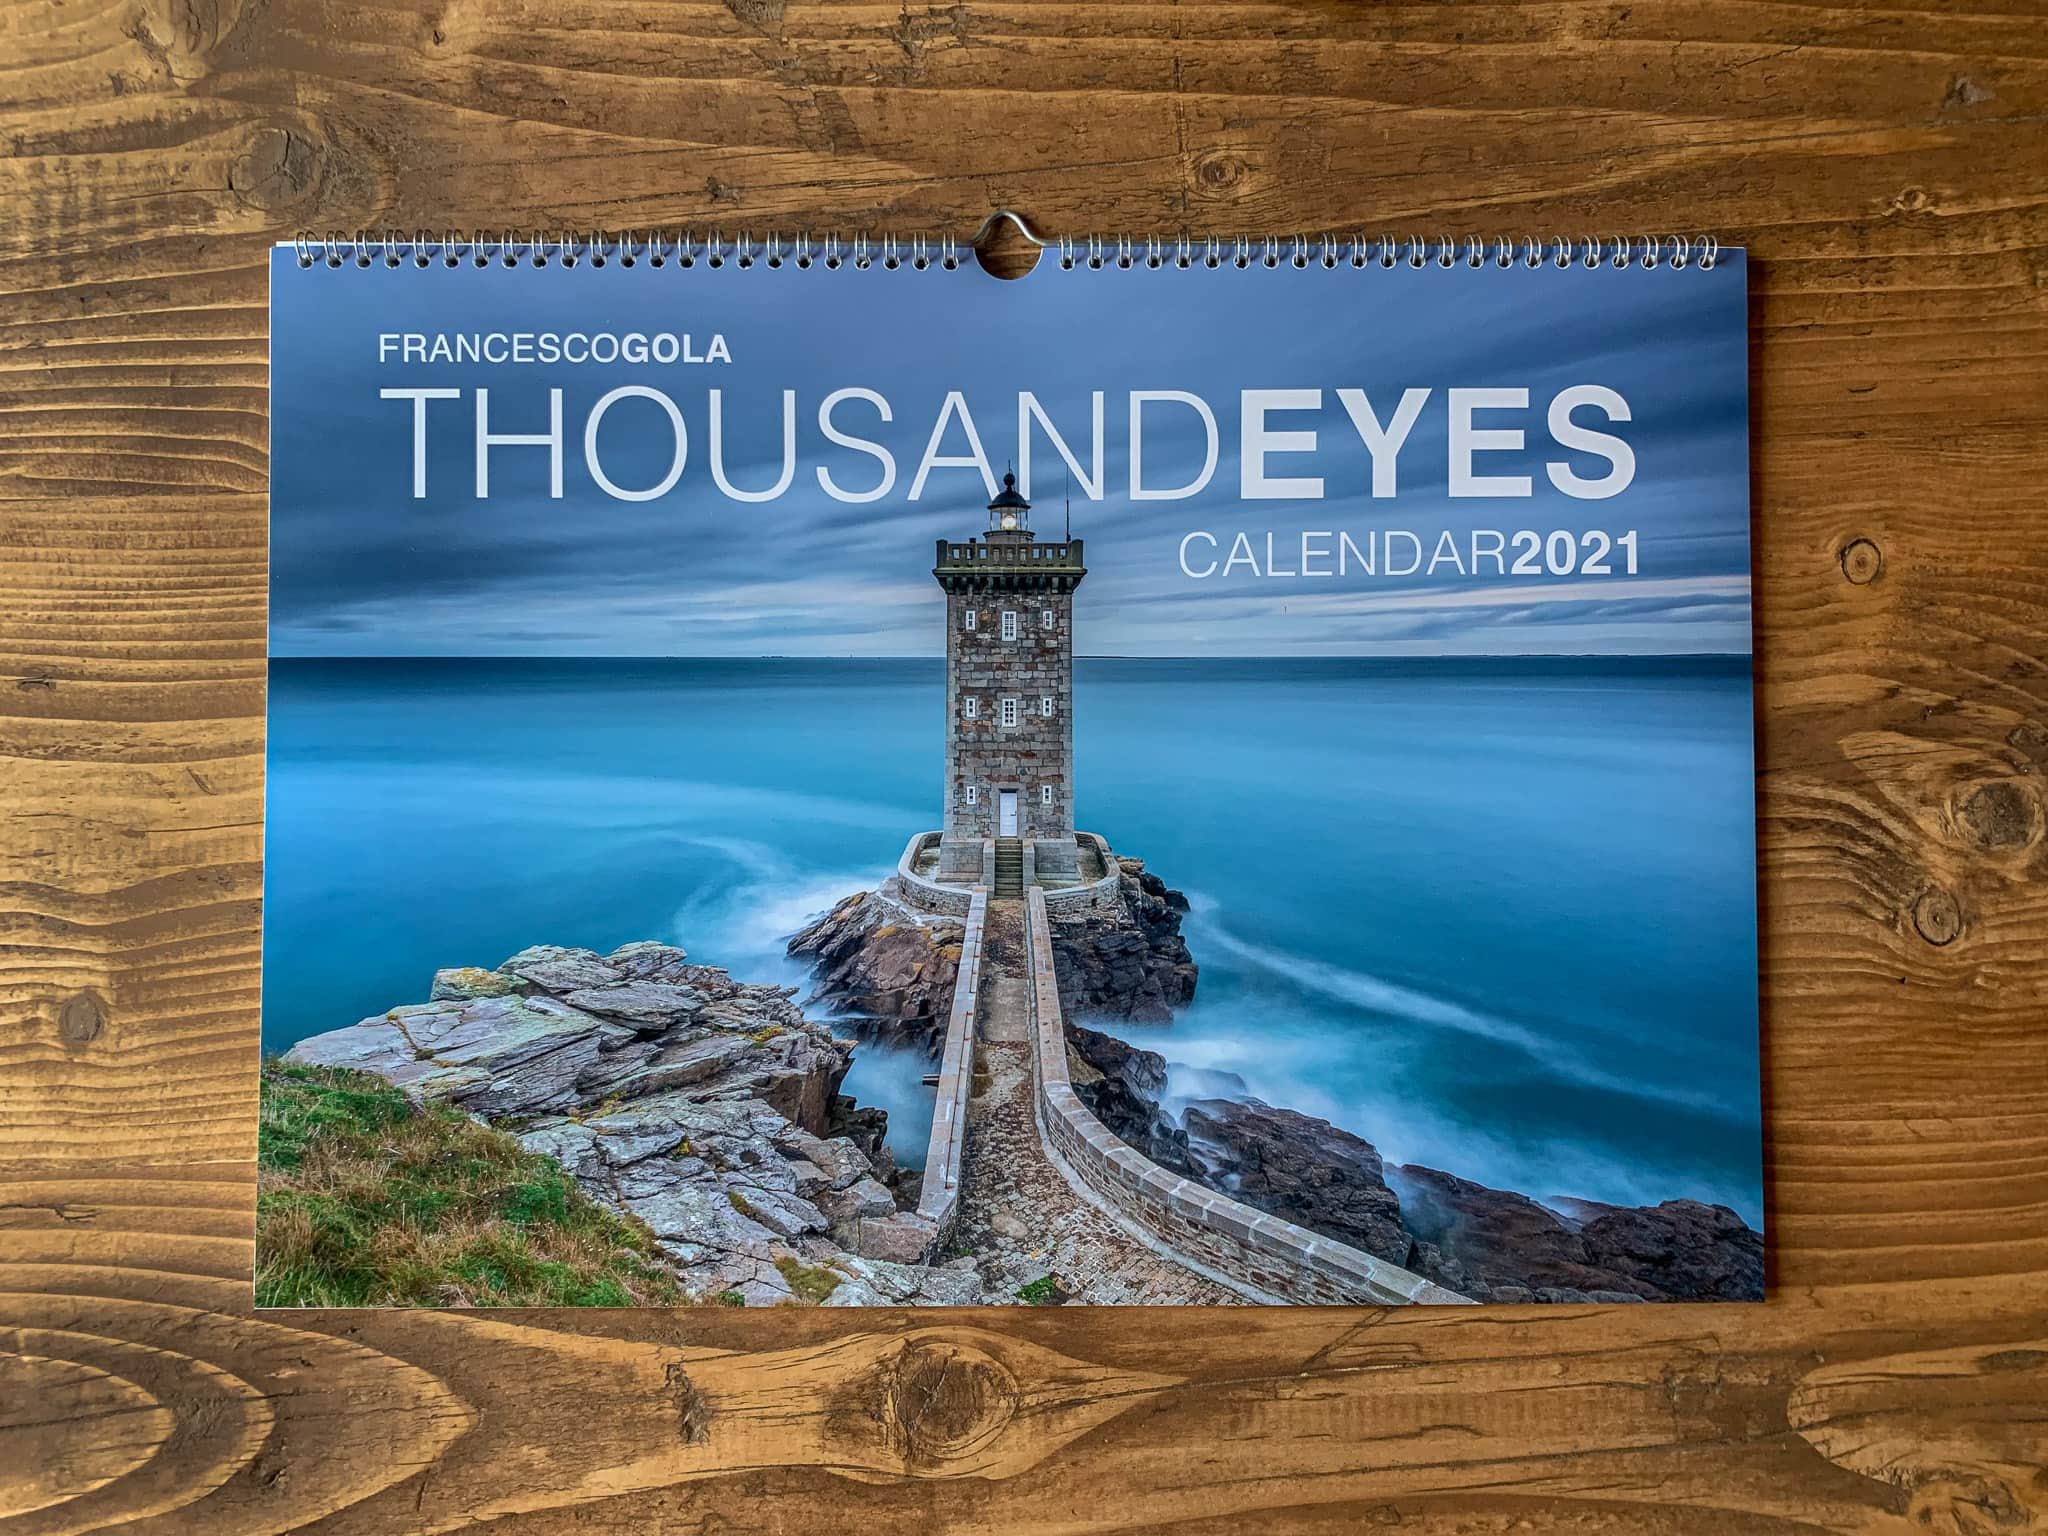 Francesco Gola Seascape FineArt Calendar 2021 Thousand Eyes Lighthouses Detail 1